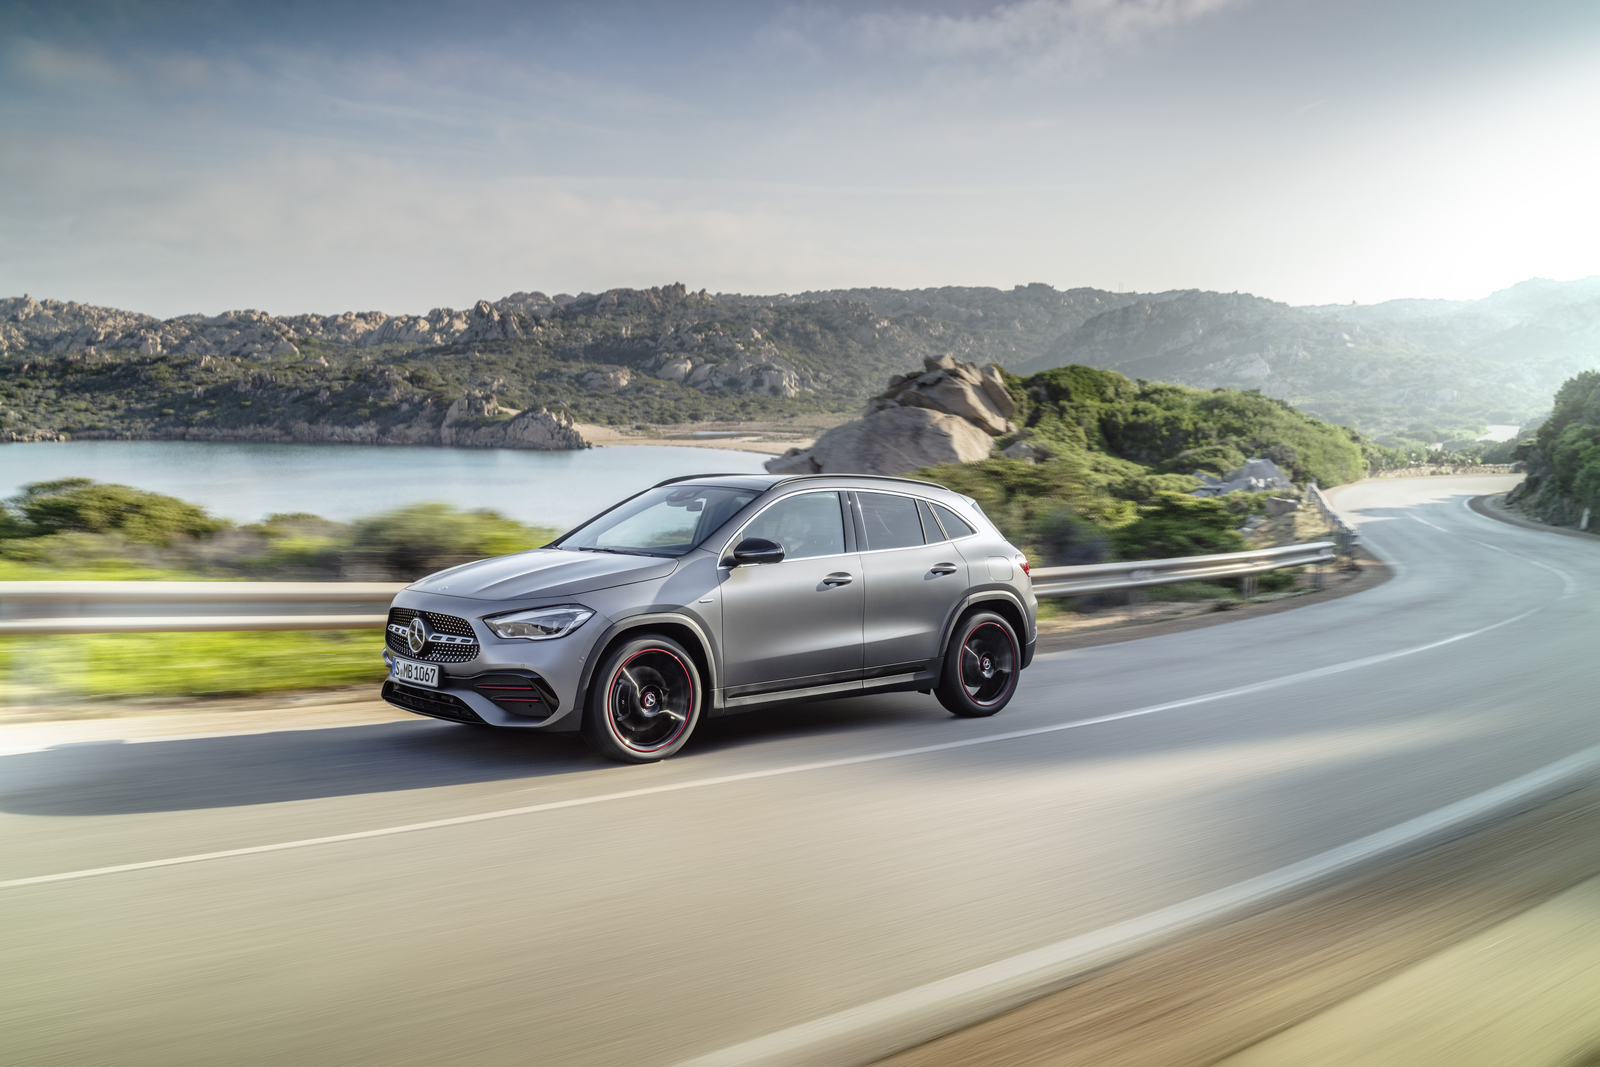 Mercedes Benz Gla 2019 Mercedes Benz Gla 2019